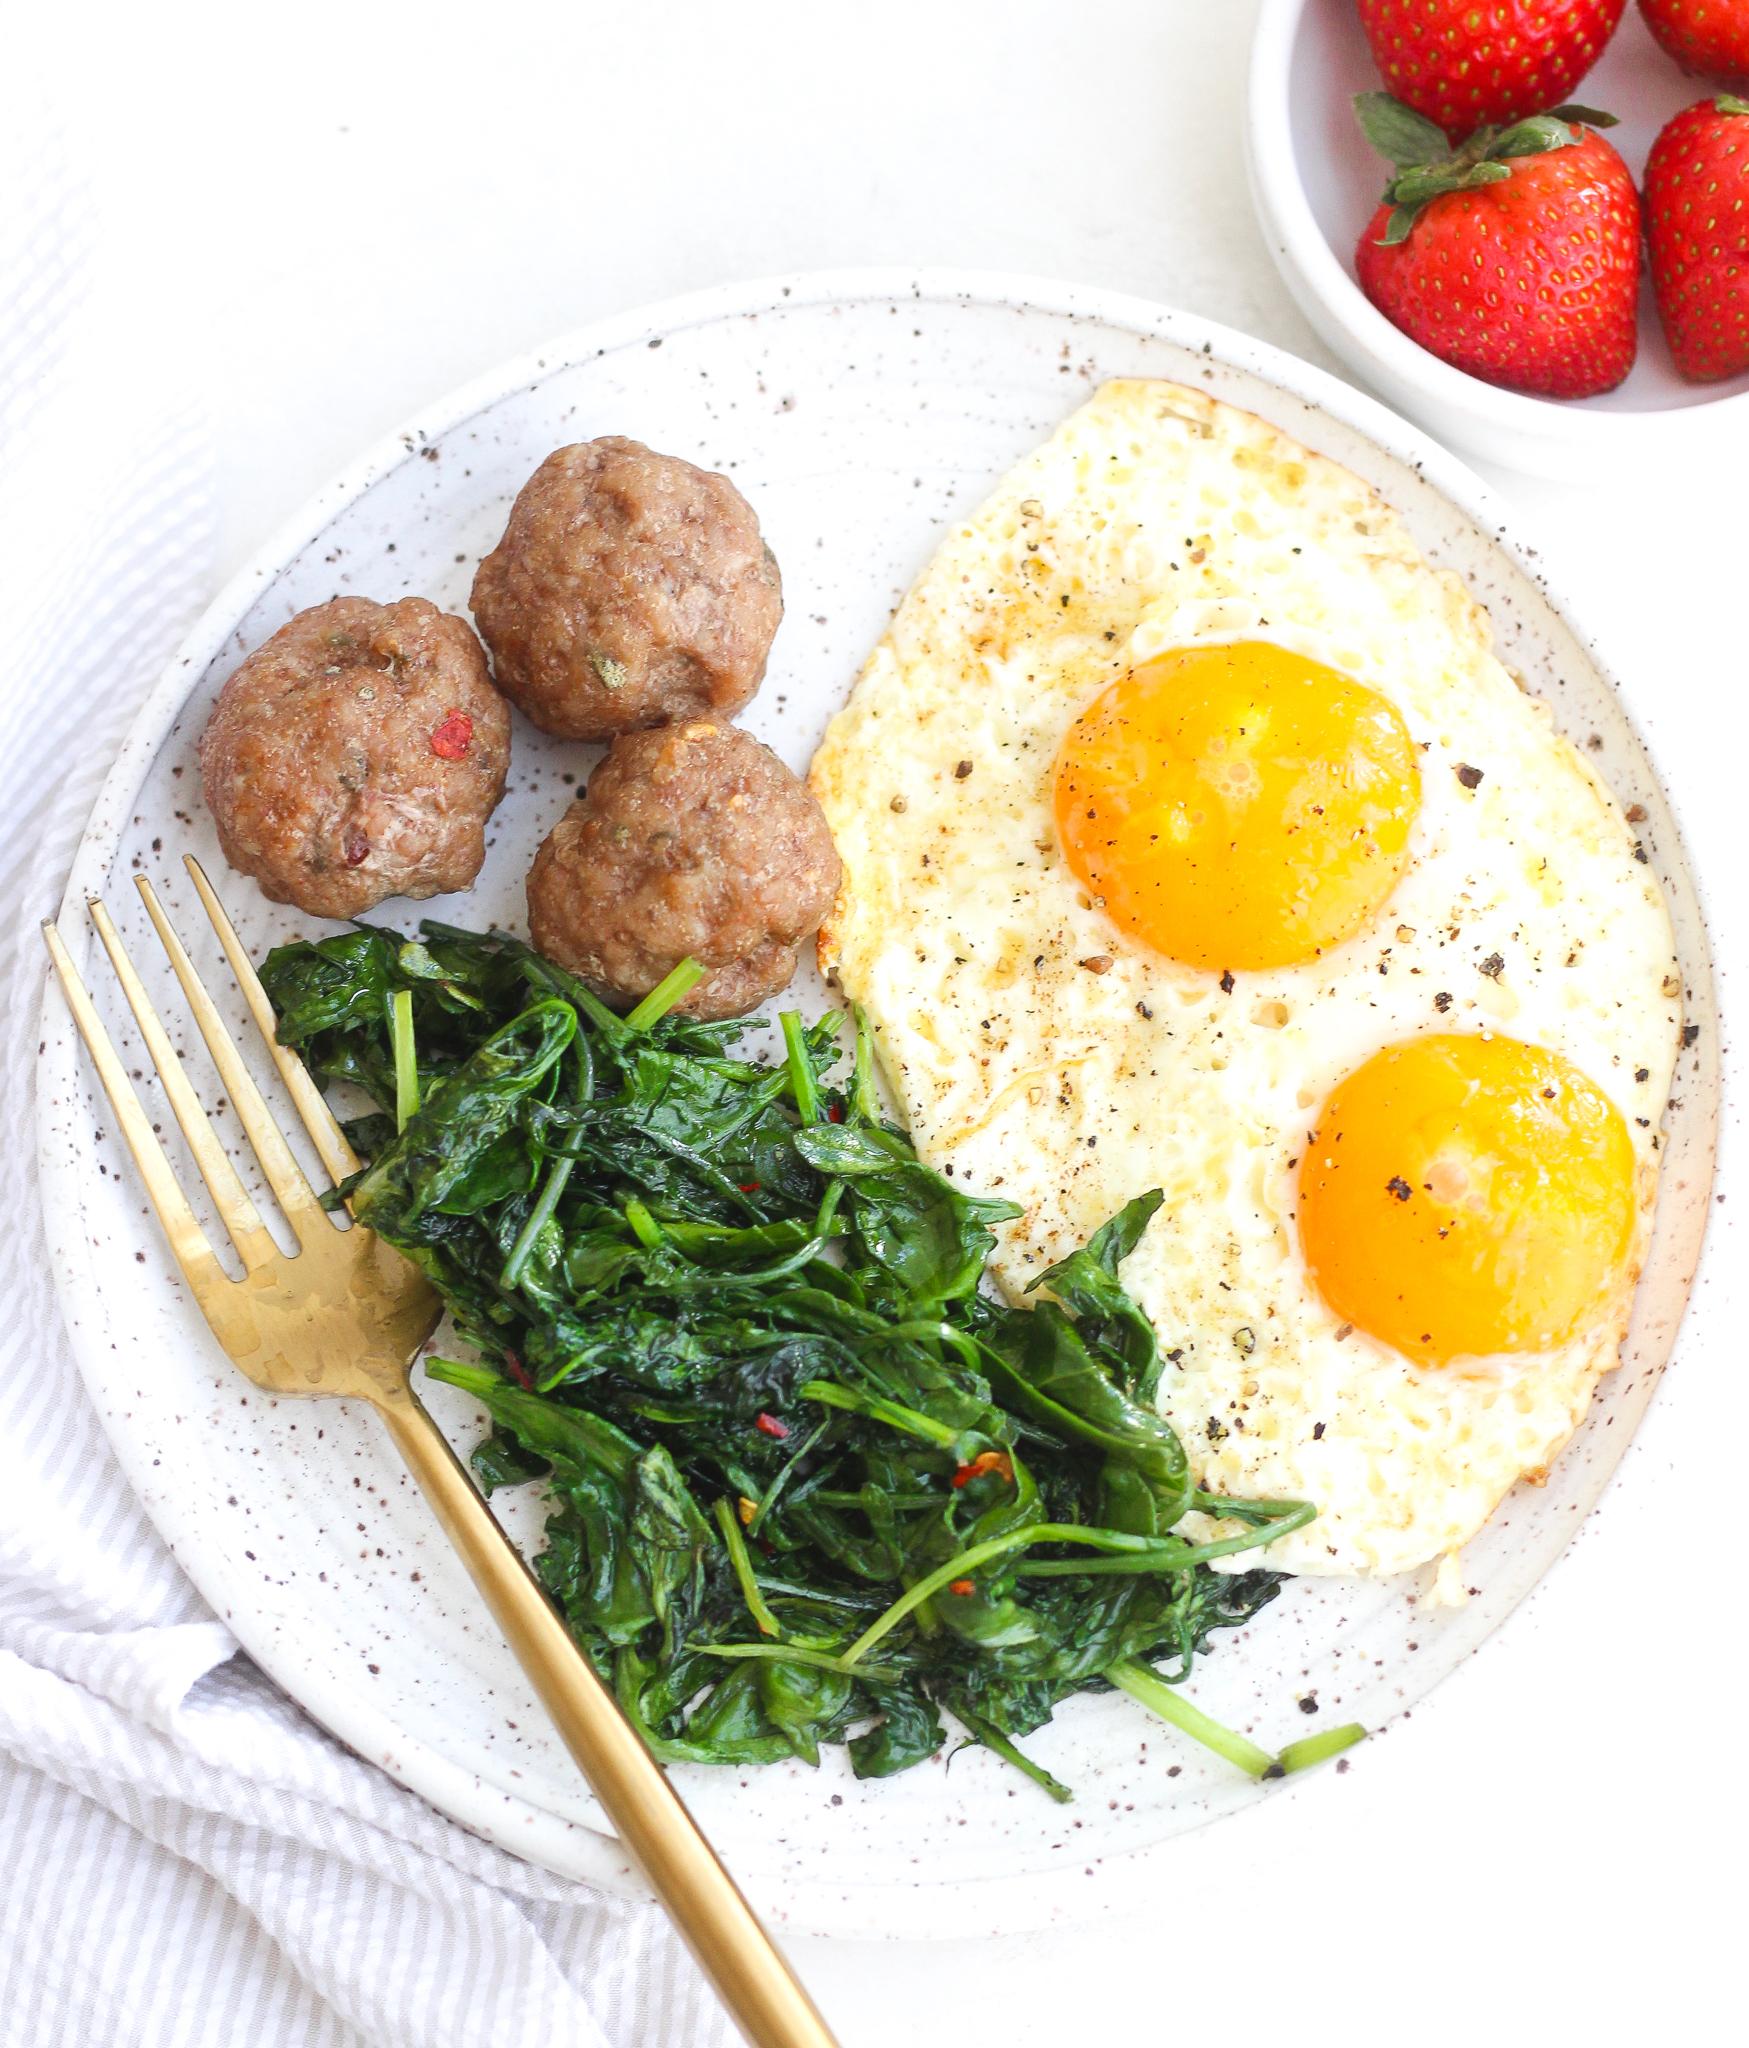 breakfast meatballs on a ceramic plate served alongside sautéed kale and sunny side up eggs